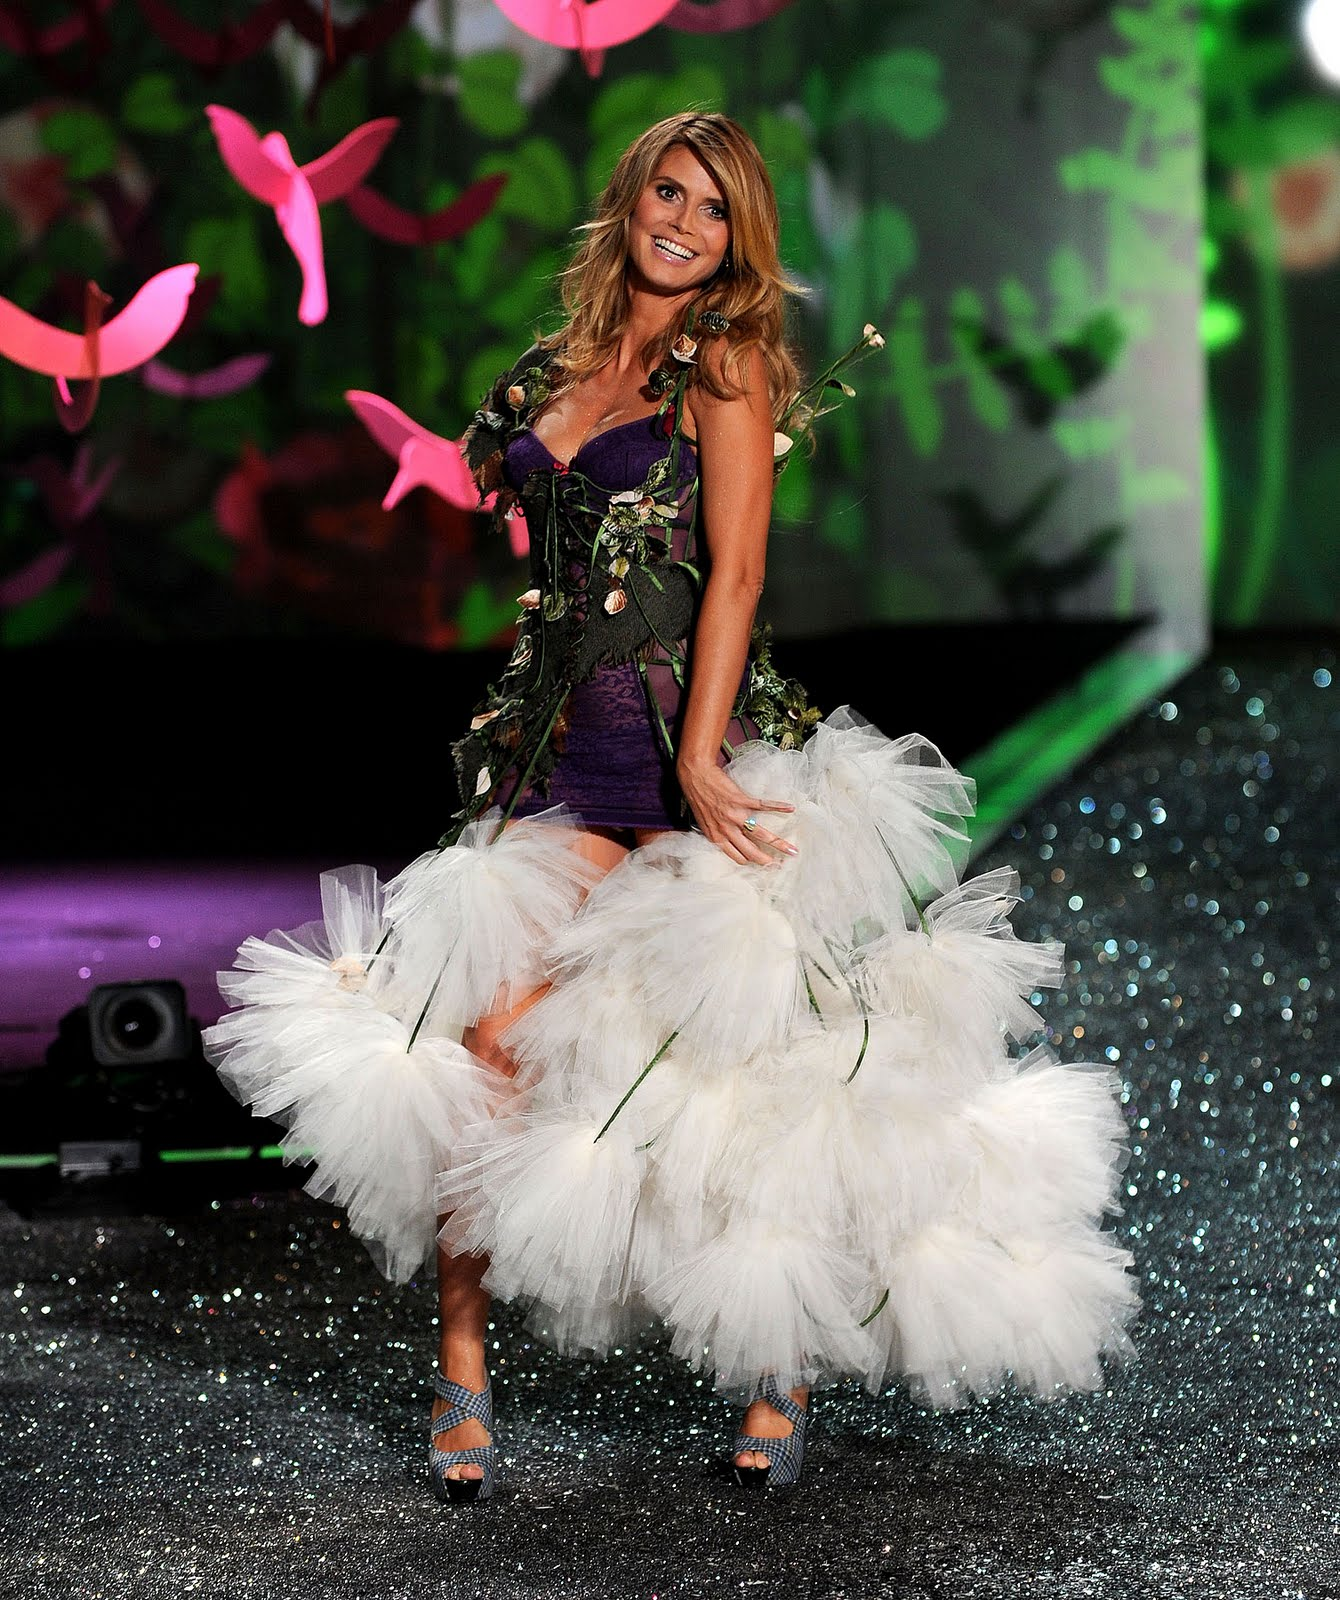 http://4.bp.blogspot.com/_TL3kwXYIJaI/SwhPecDQZYI/AAAAAAAADdk/92fV3cgtSls/s1600/The+2009+Victoria%27s+Secret+Fashion+Show+025.jpg